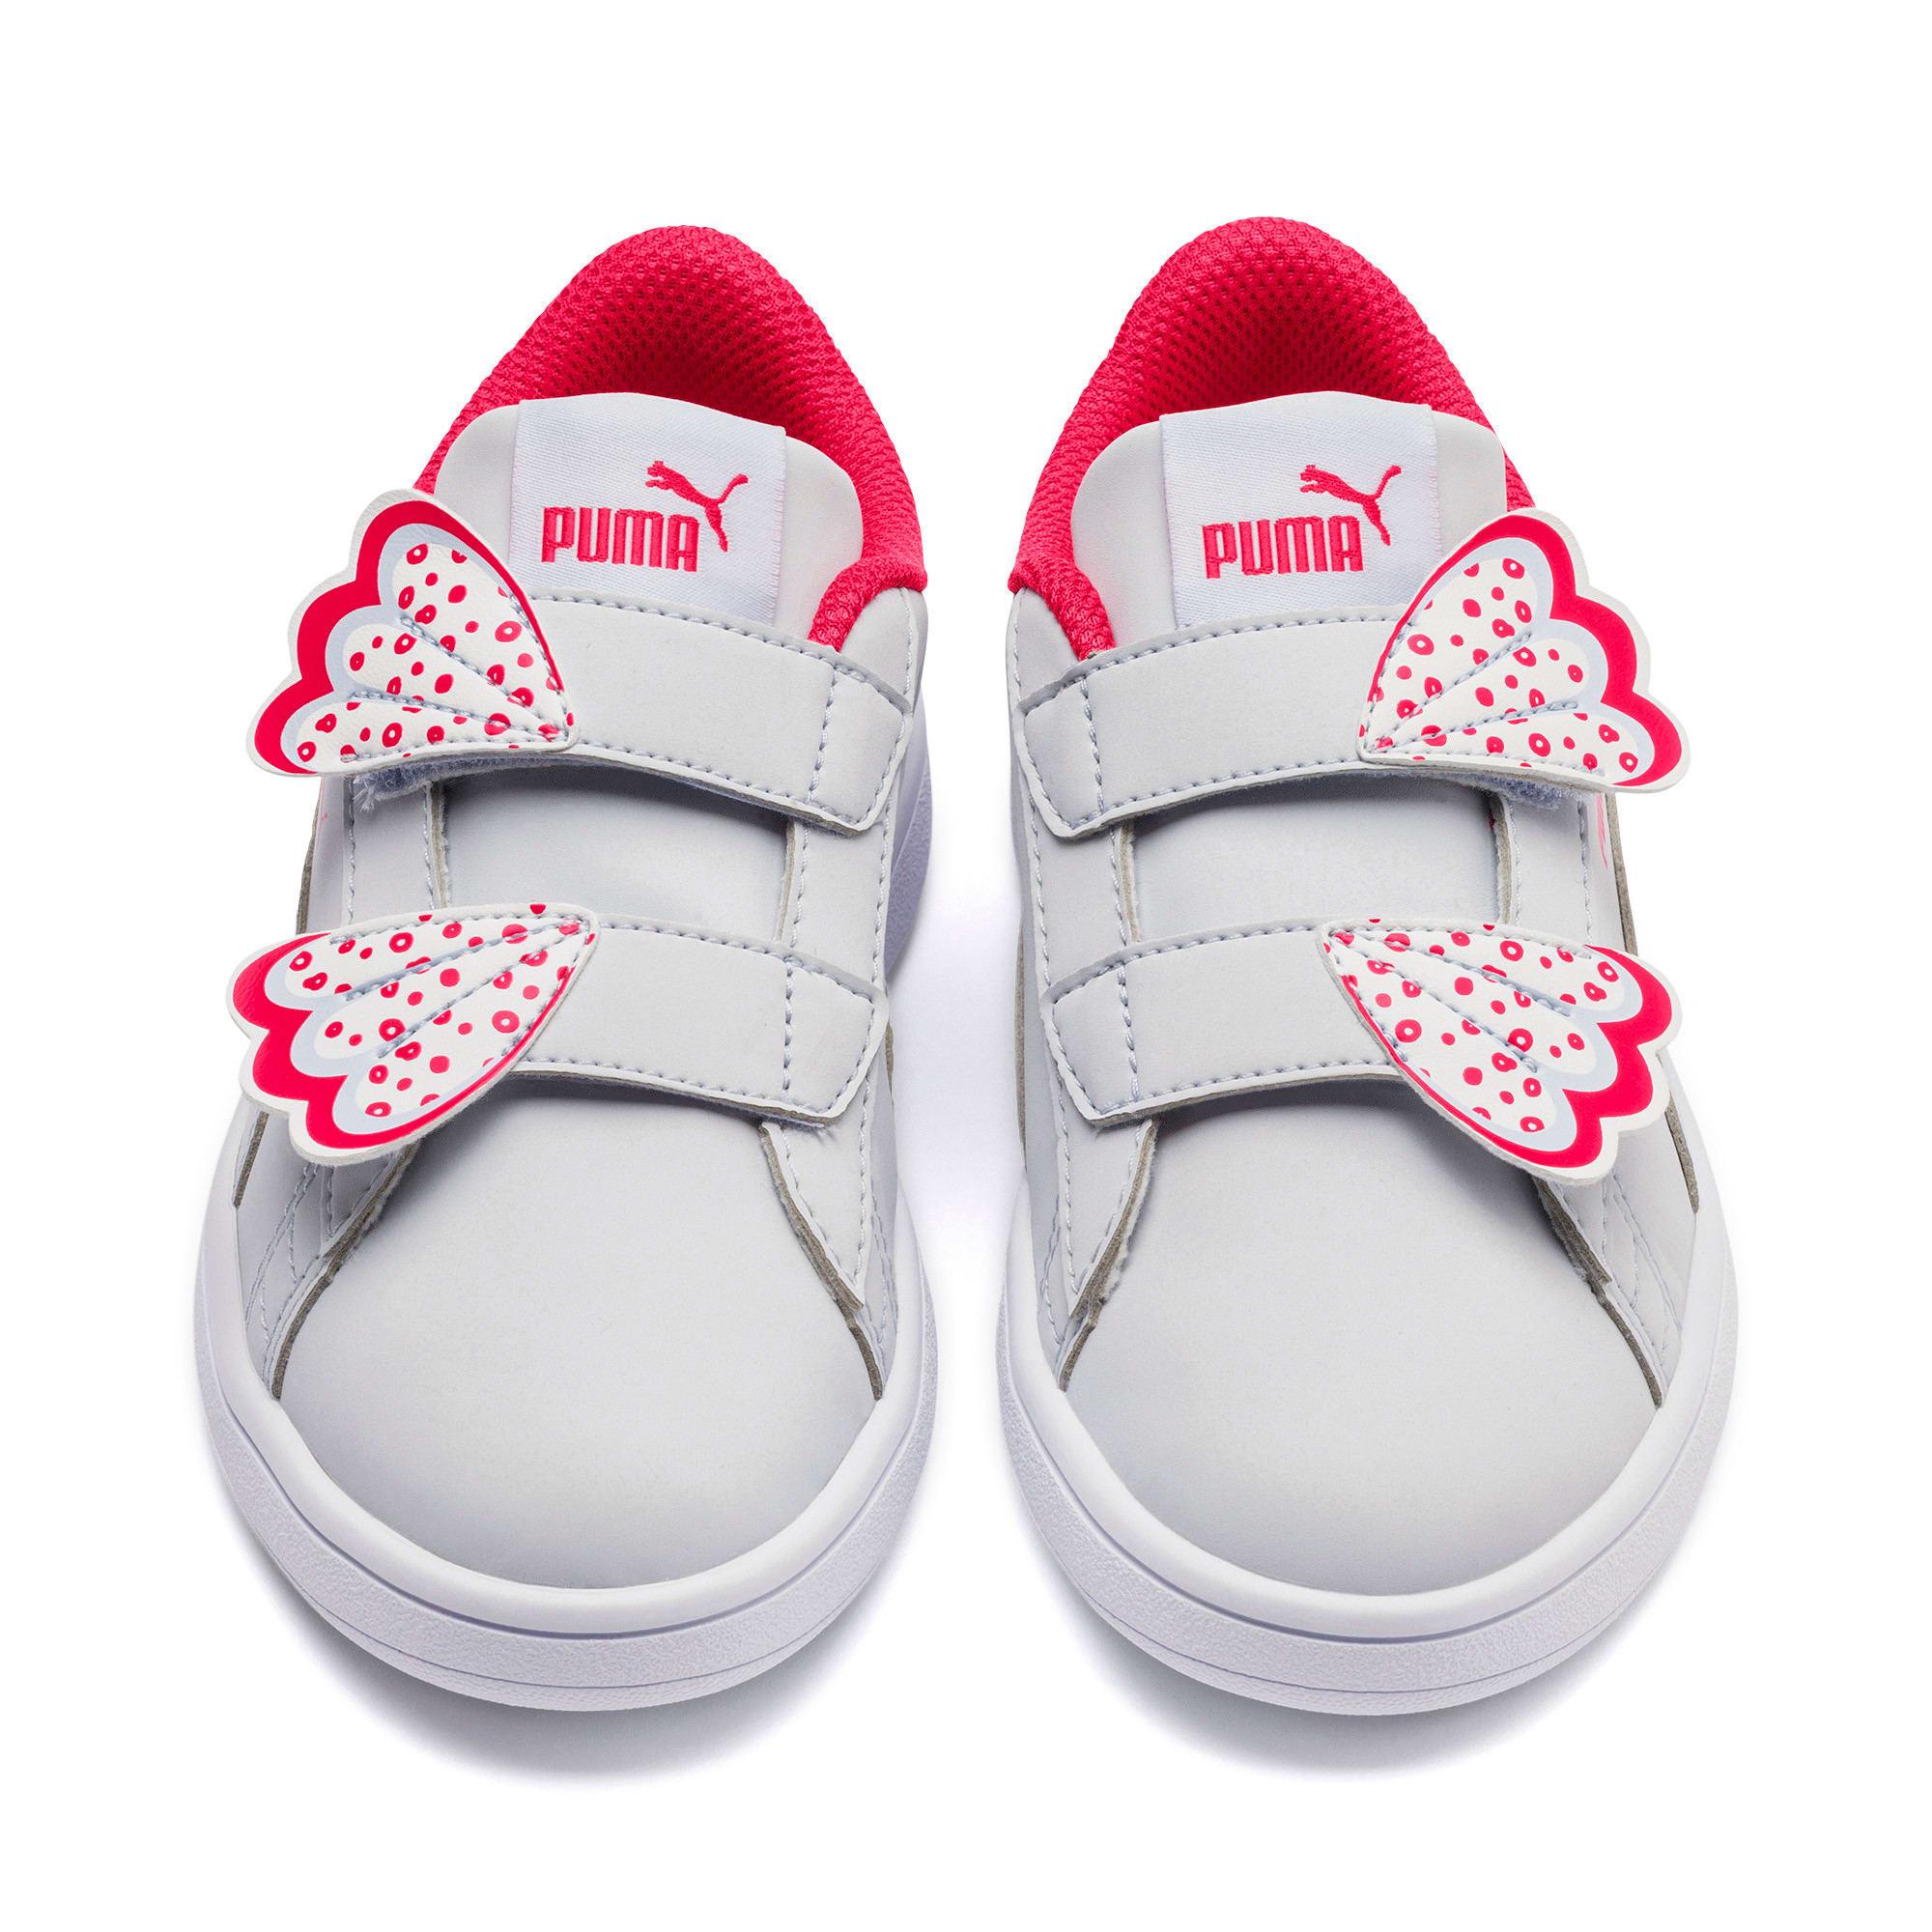 Thumbnail 7 of Puma Smash v2 Butterfly Little Kids' Shoes, Heather-Nrgy Rose-Puma White, medium